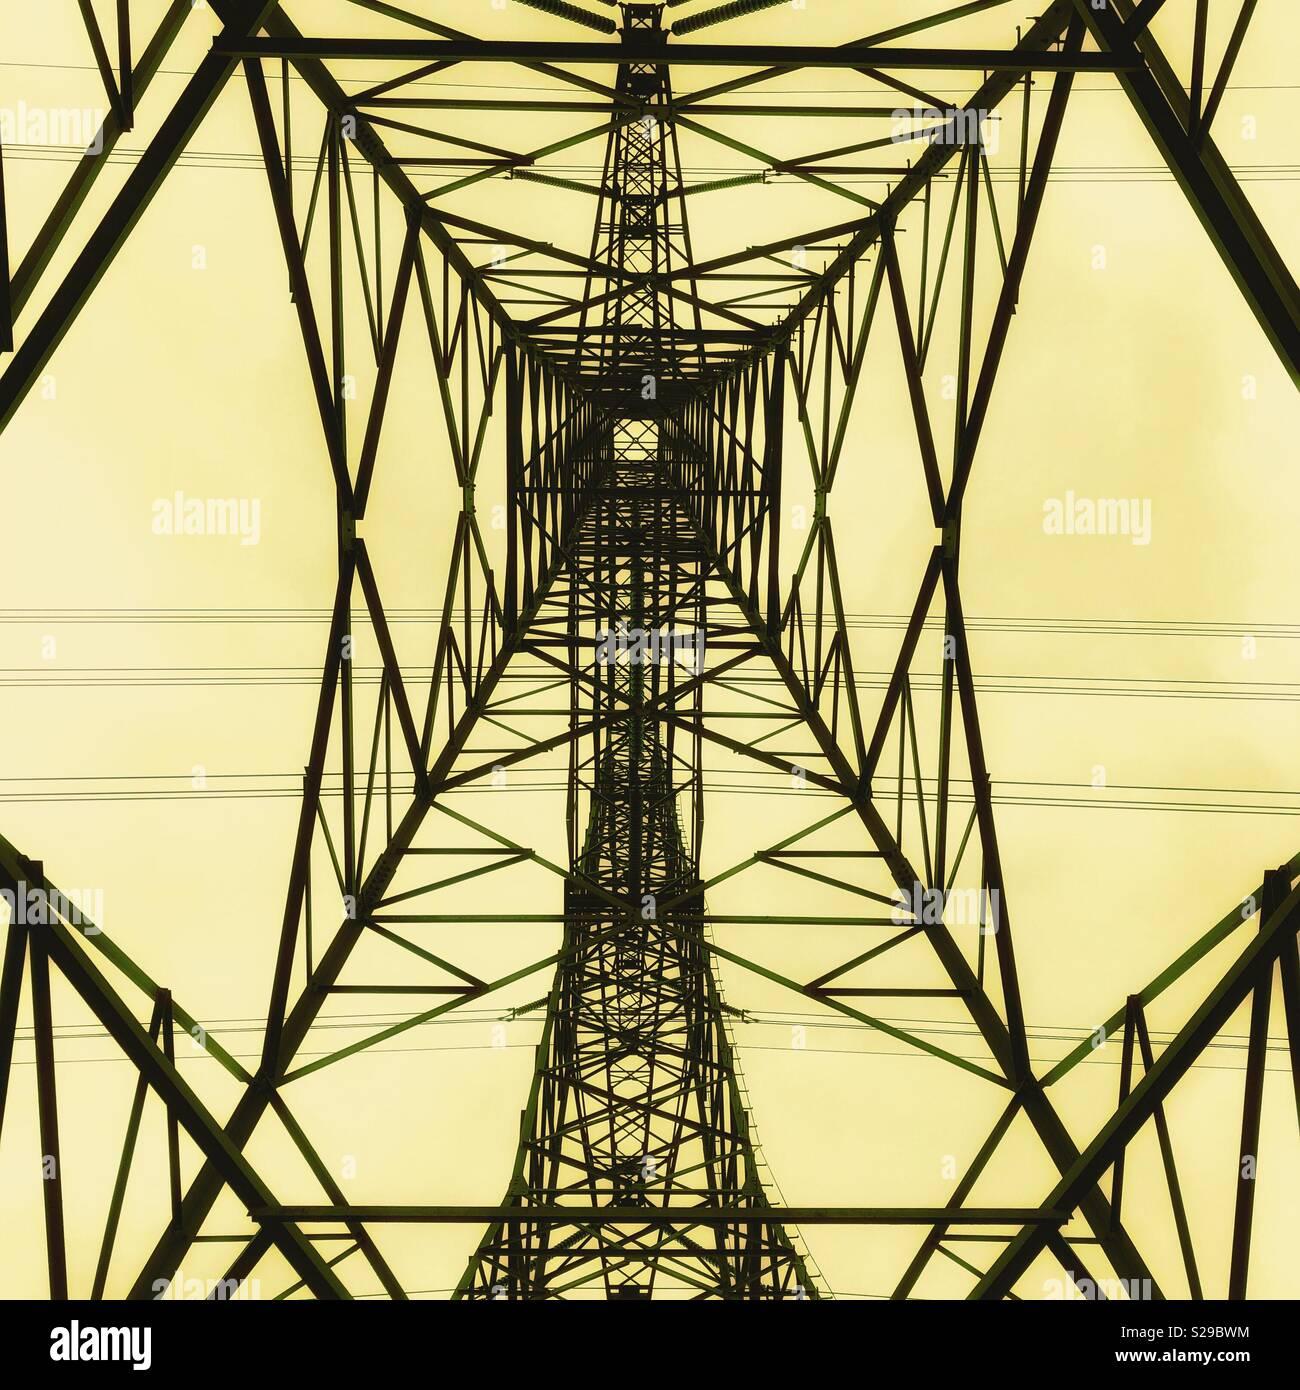 Powerlines - Stock Image